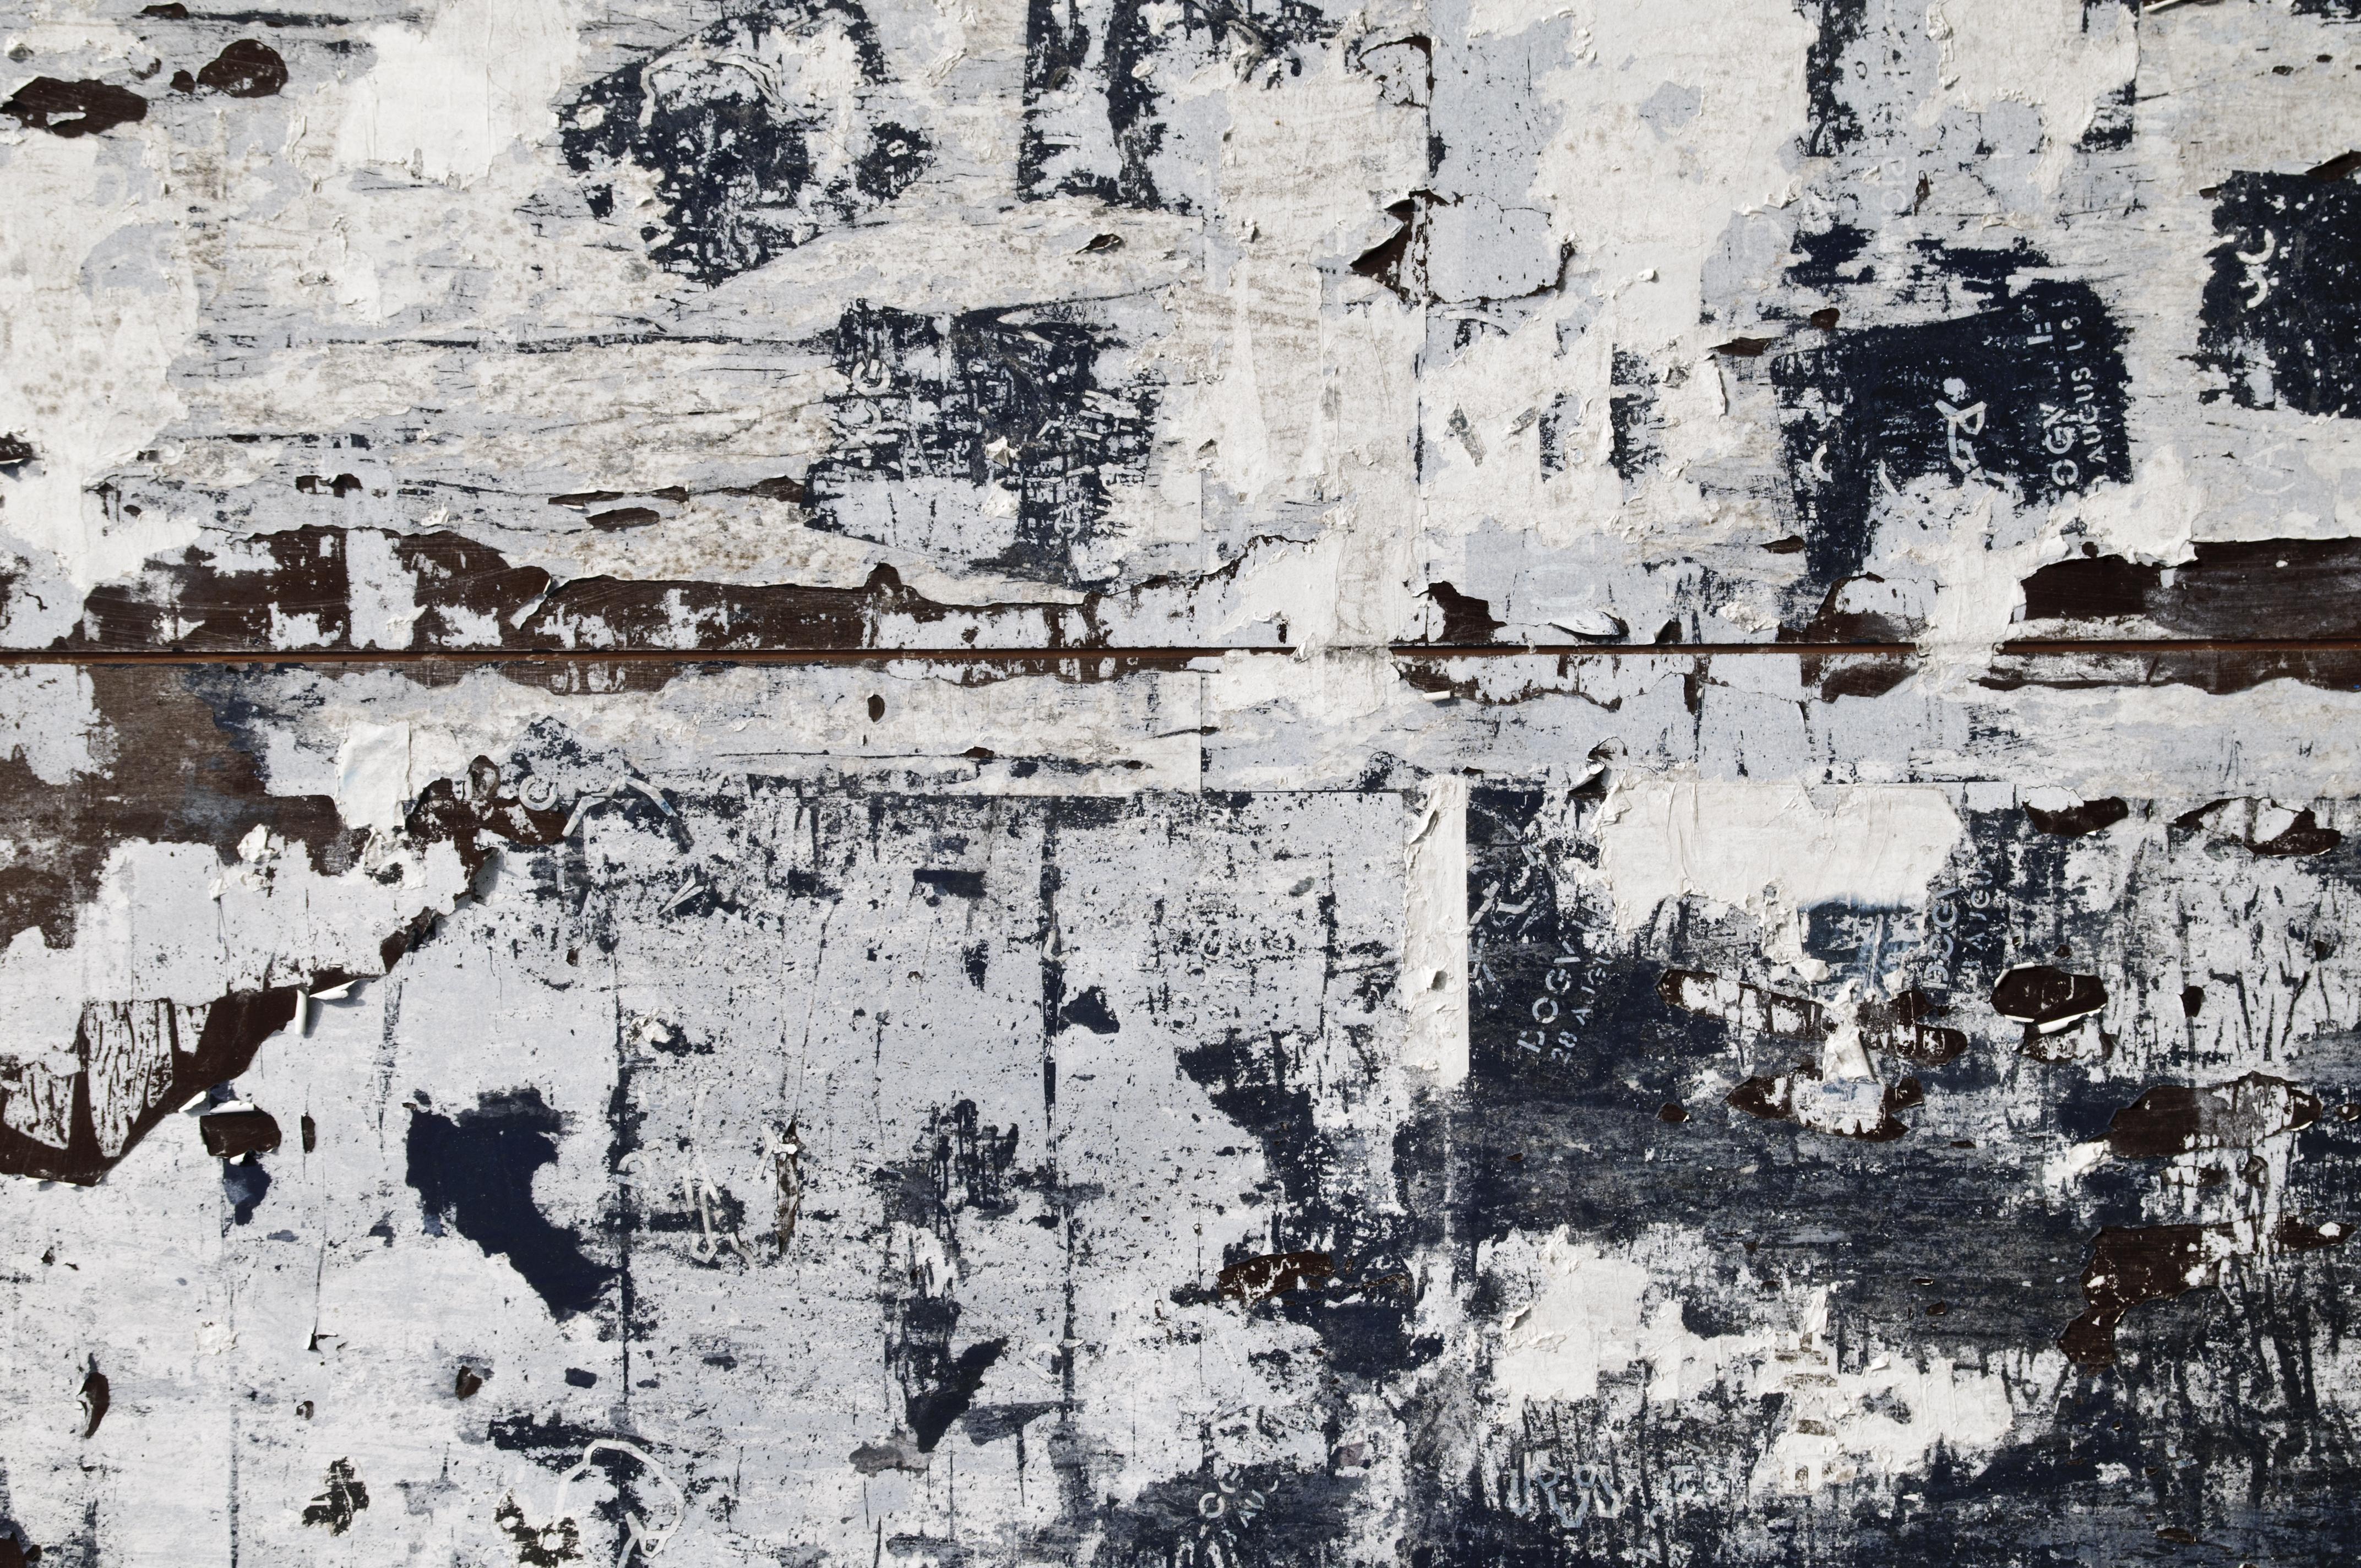 Untitled Texture 379 by aqueous-sun-textures